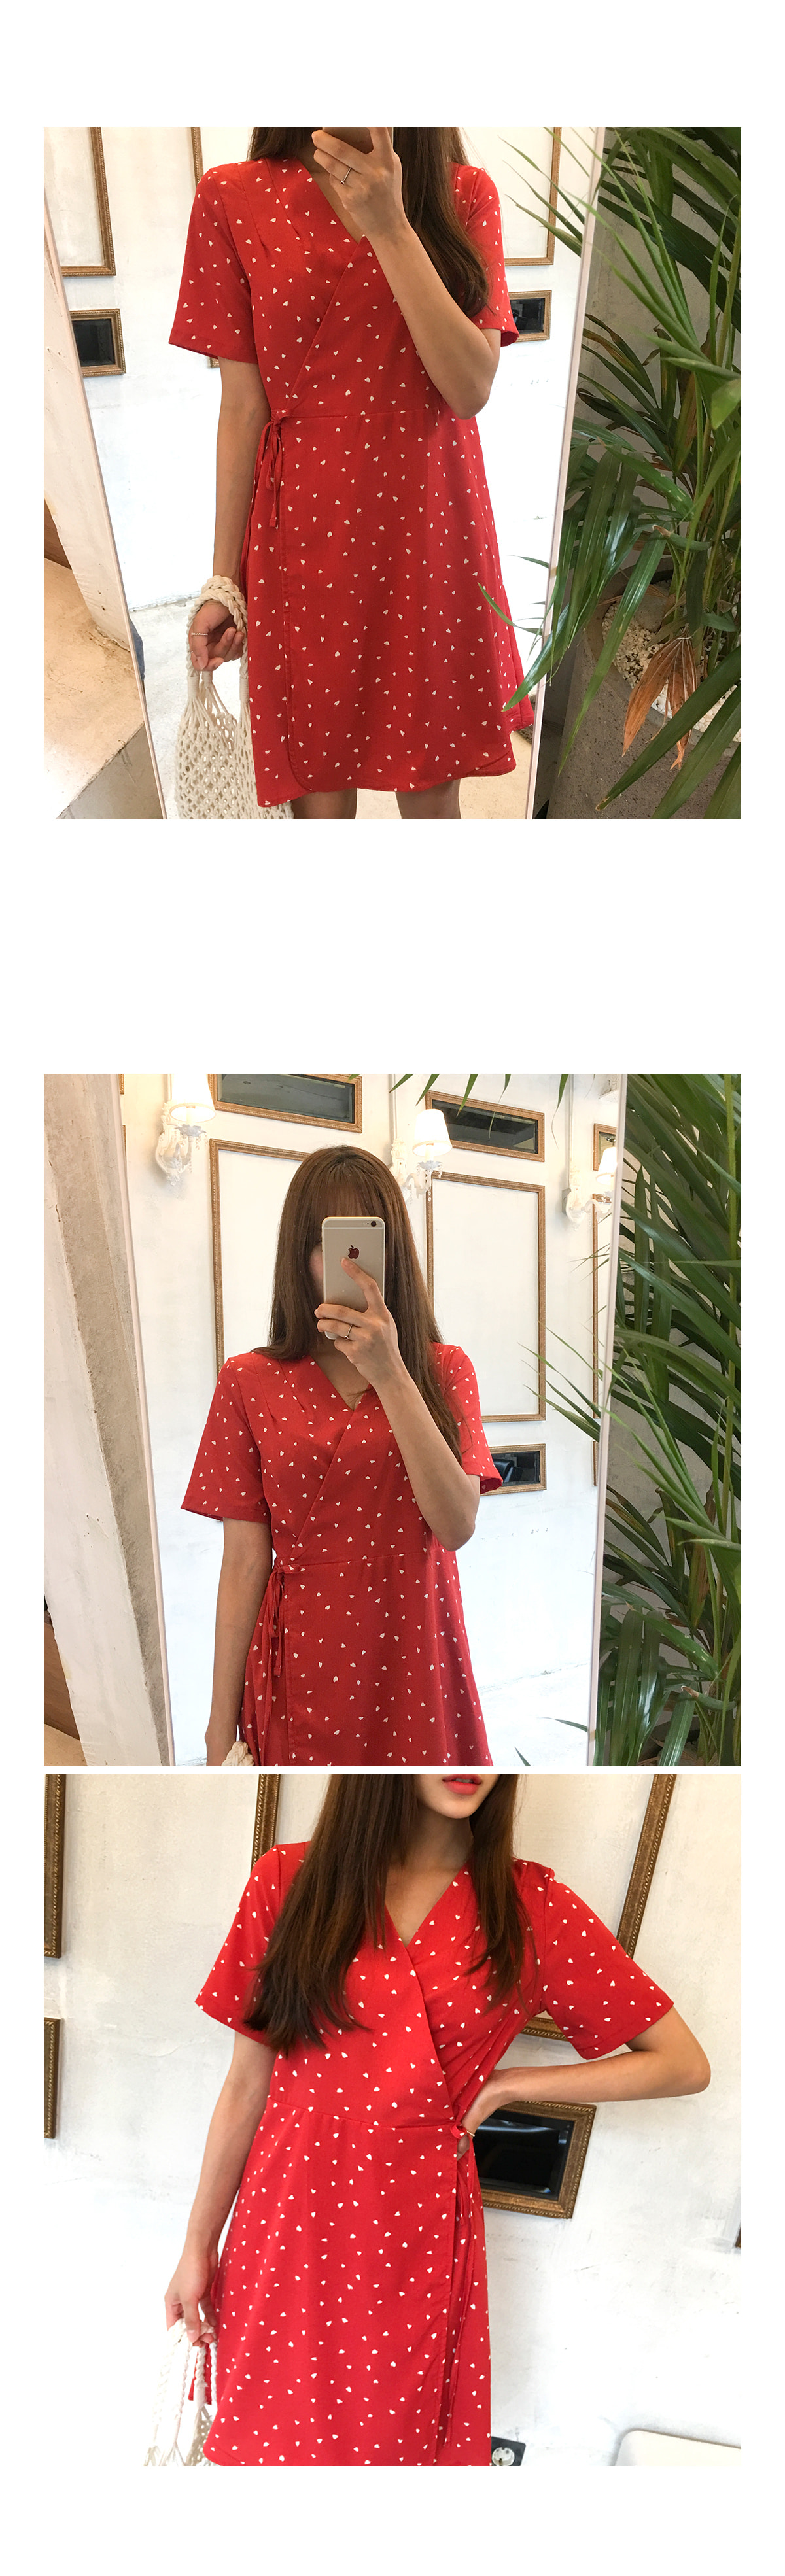 Darling heart rap dress